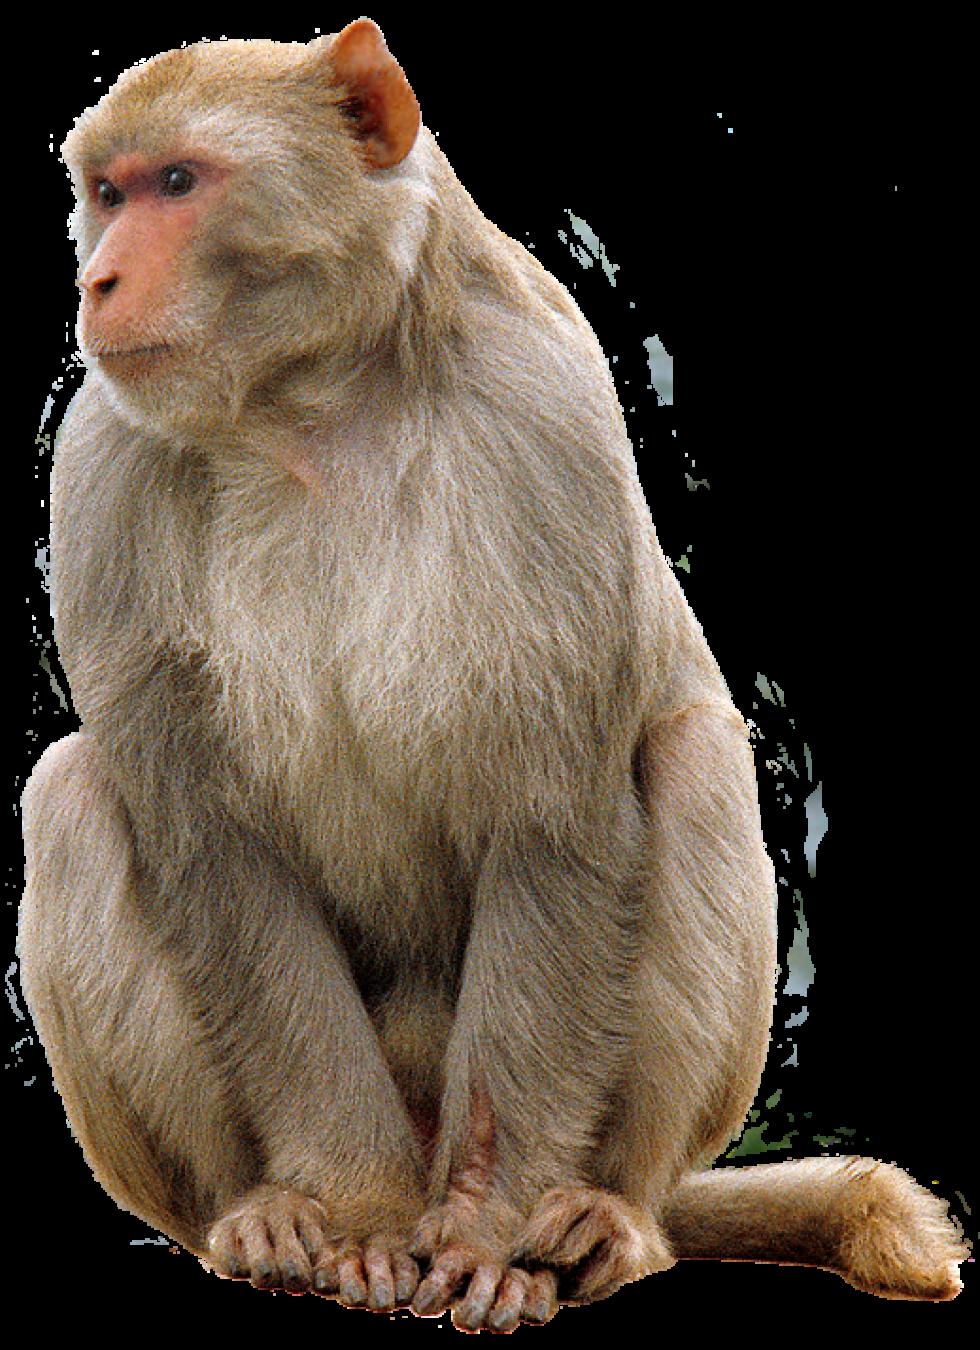 Monkey PNG Transparent Images.